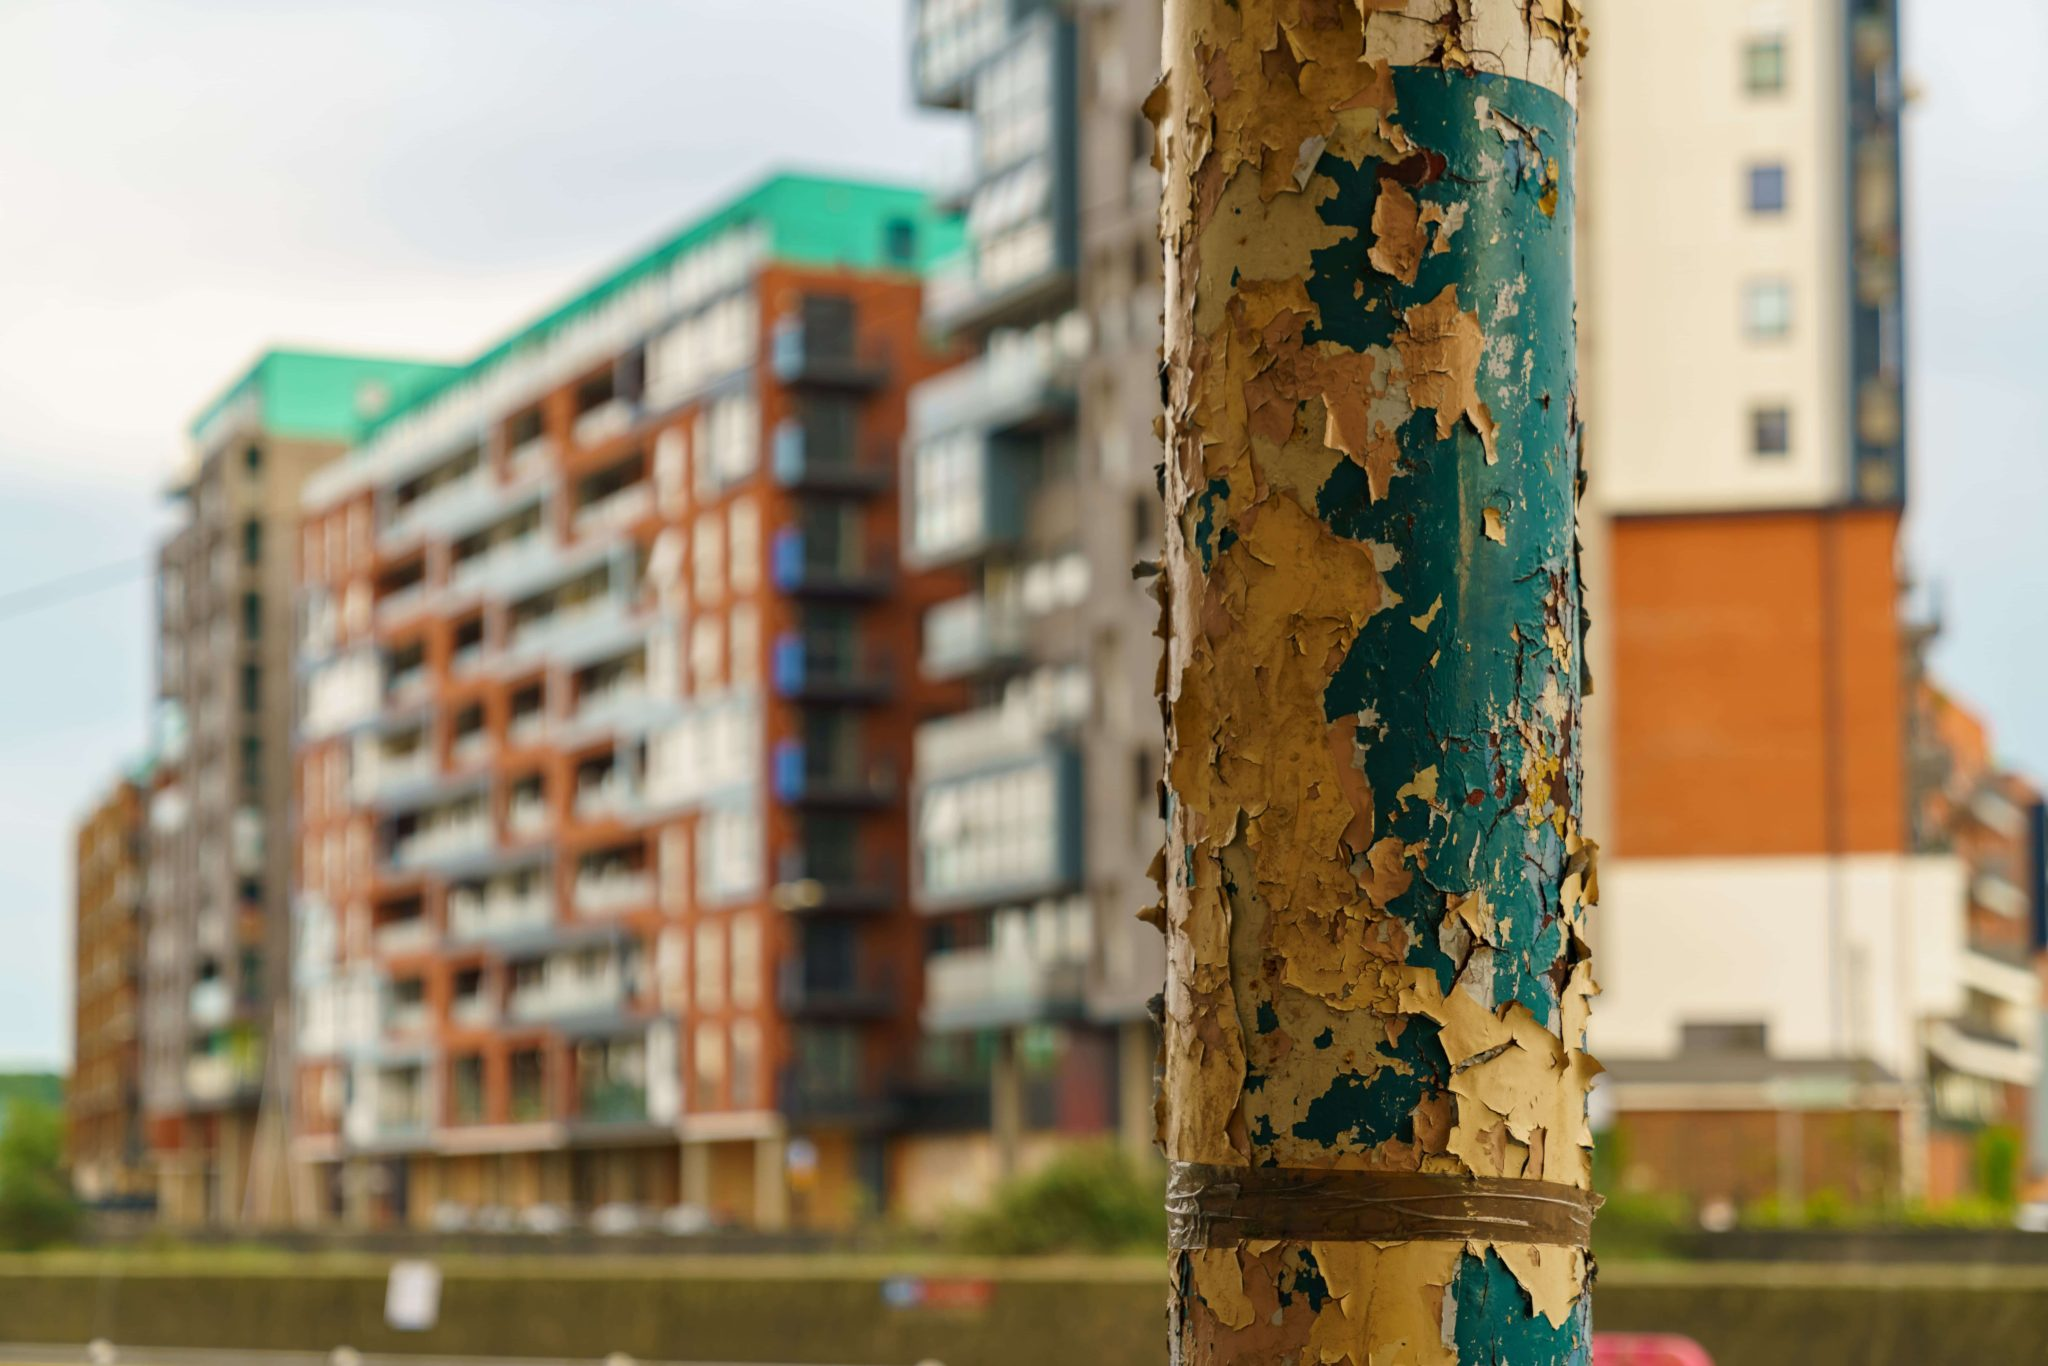 Ipswich, East Anglia